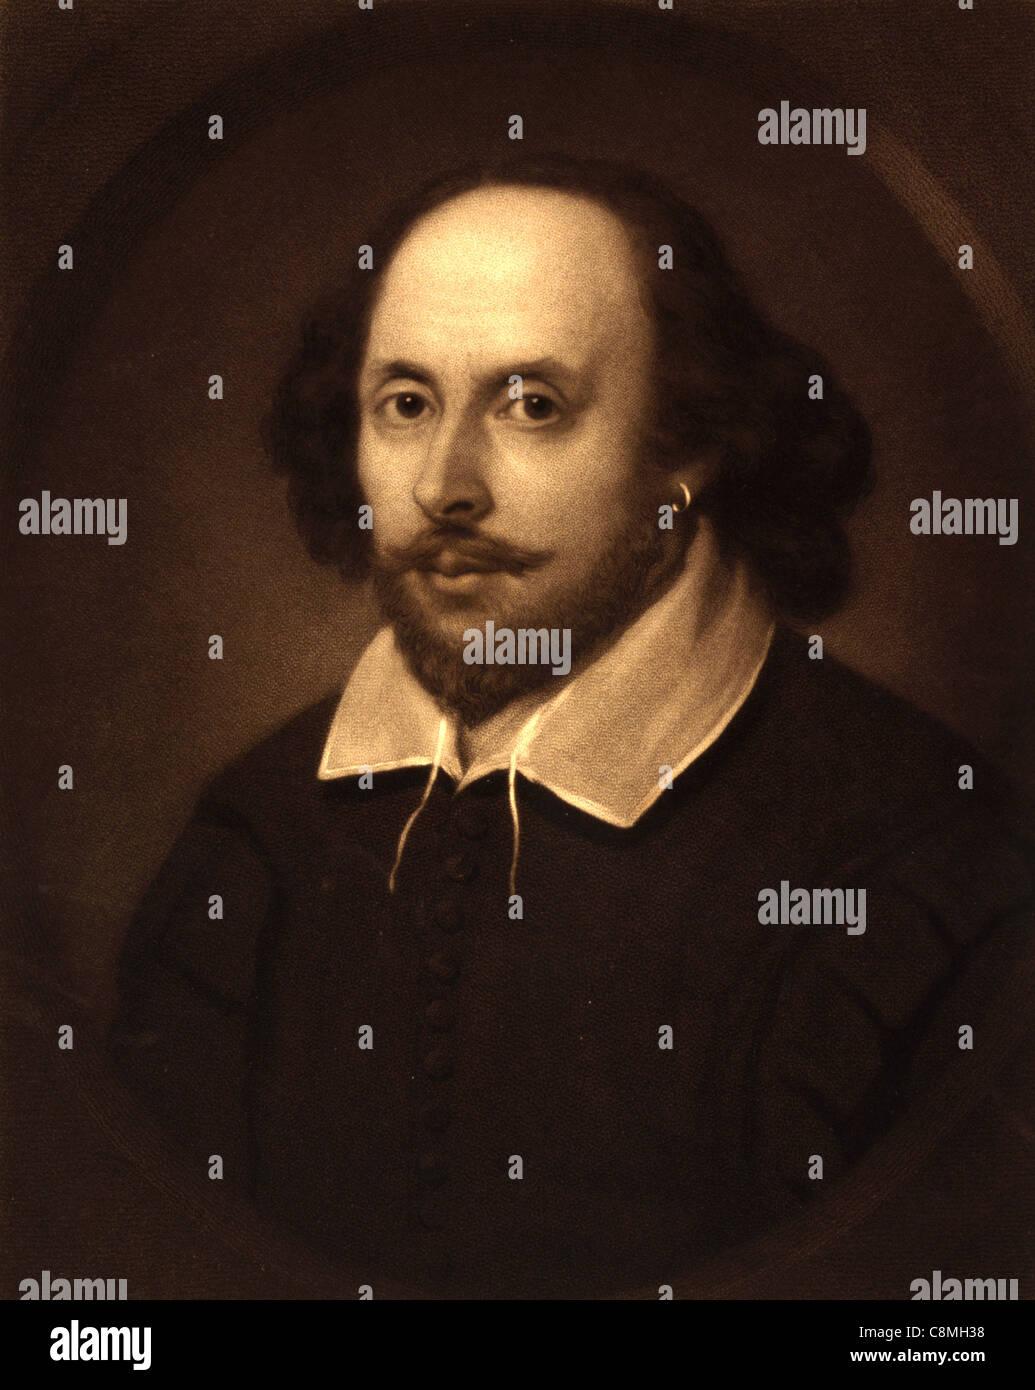 William Shakespeare, English poet and playwright. Portrait of William Shakespeare Stock Photo